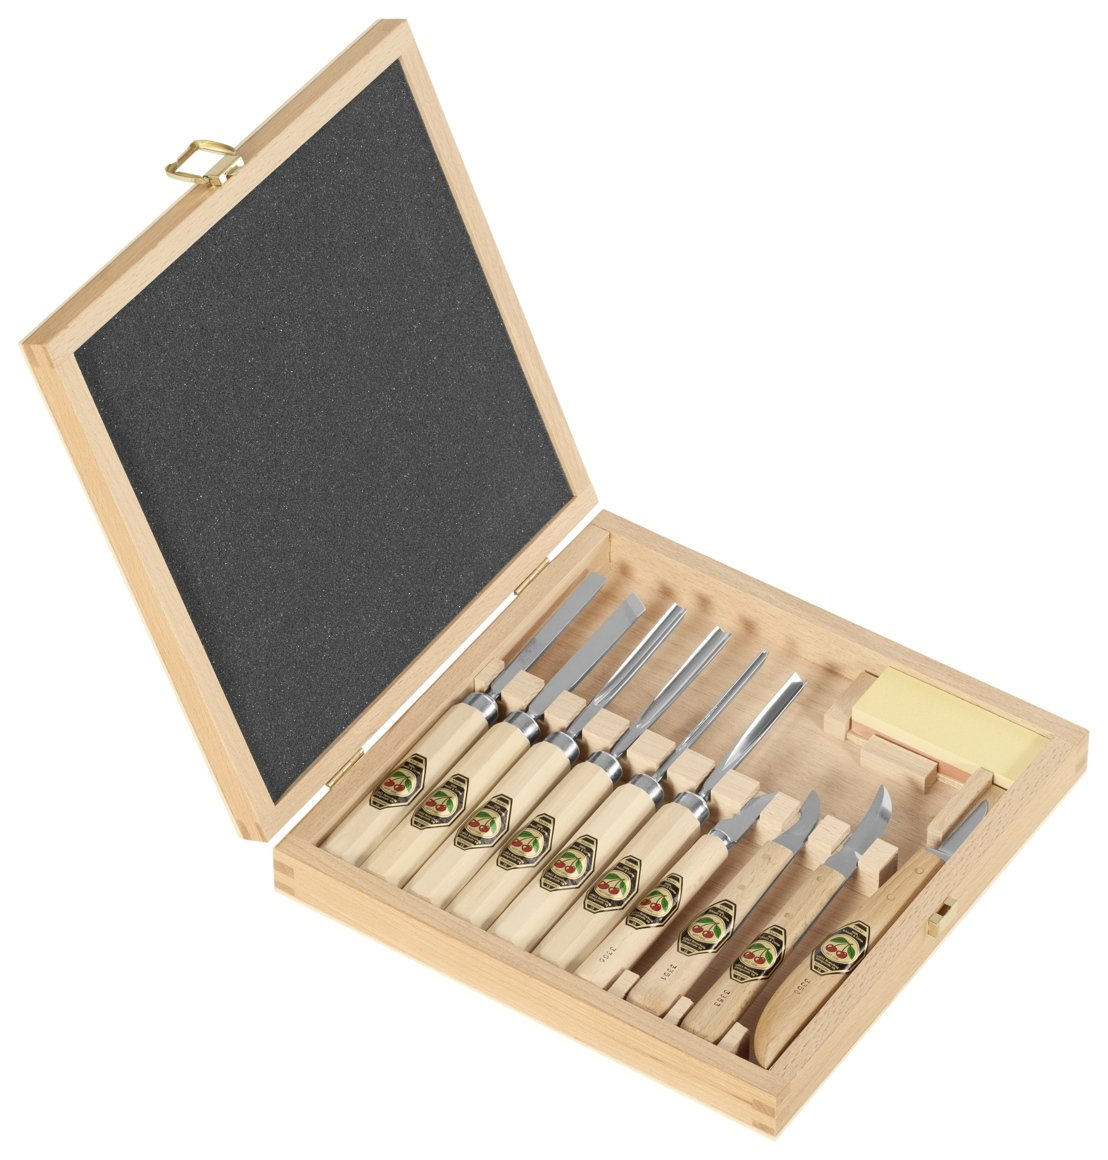 Kirschen 3441000 11-piece Carving Tools